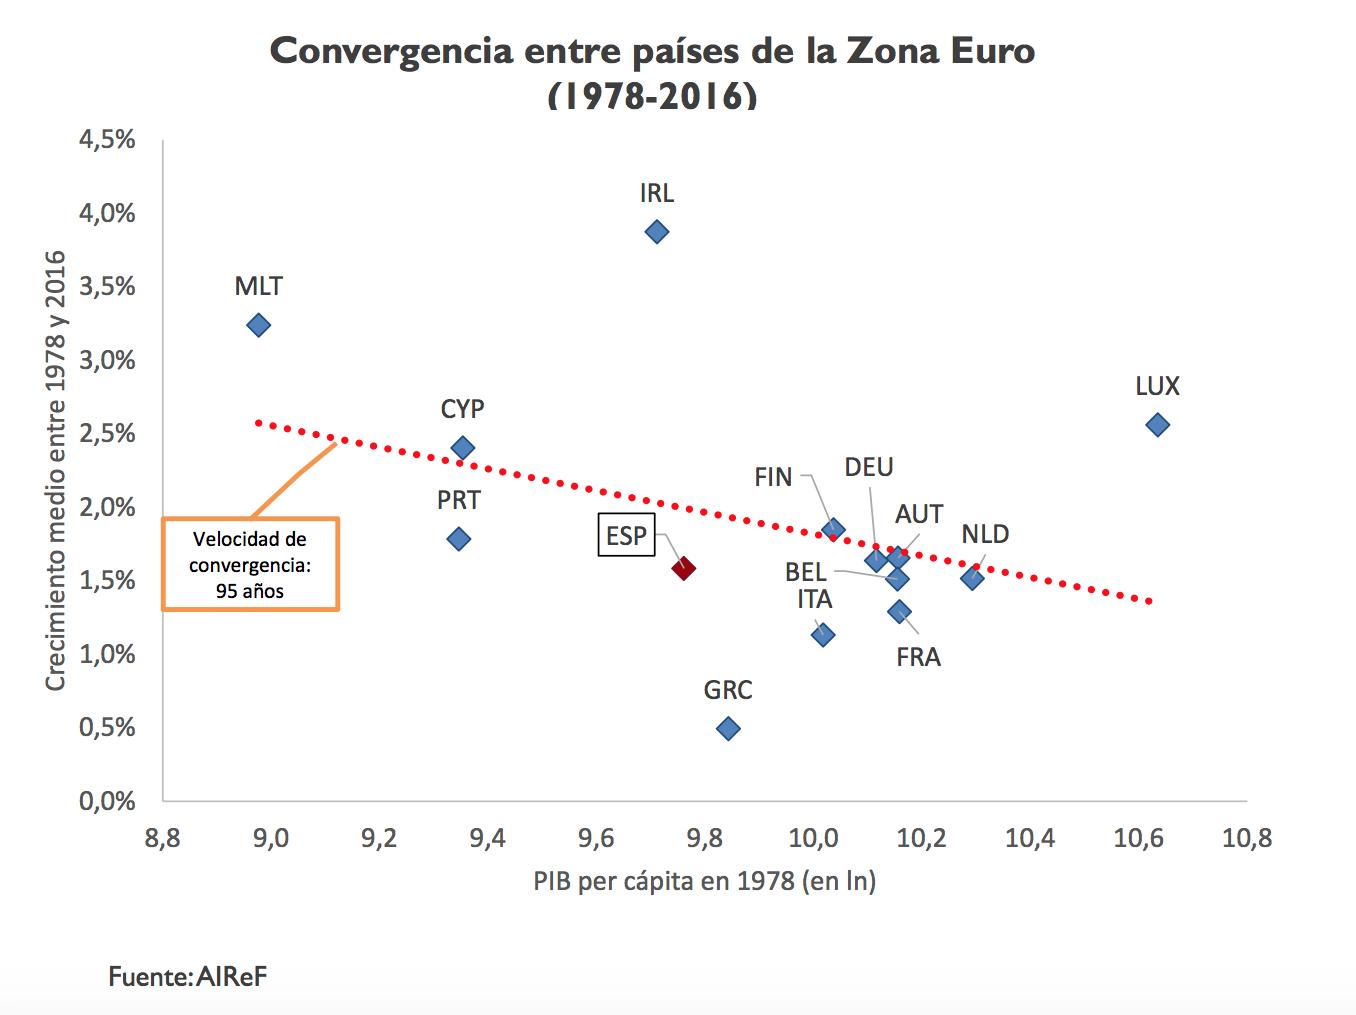 2-convergencia-pib-per-capita-espana-pai